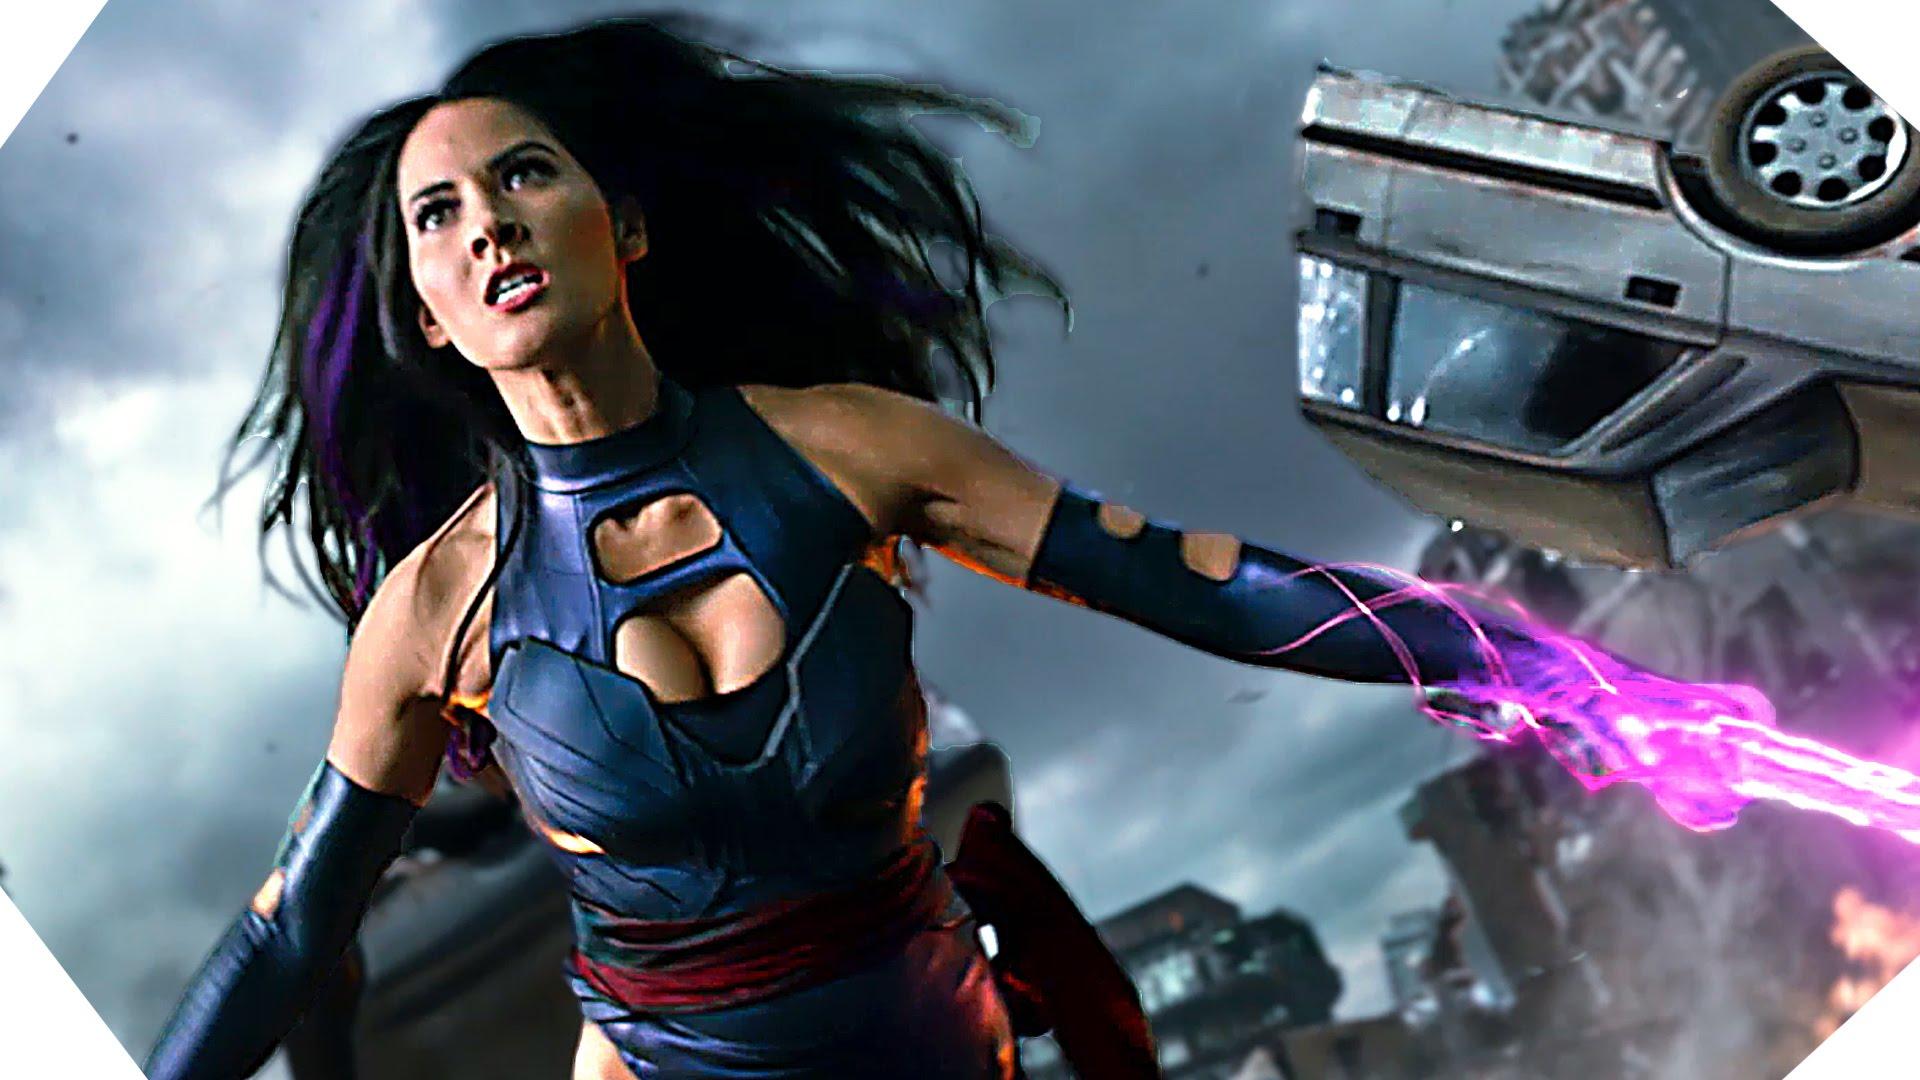 X Men Apocalypse Superbowl Trailer Super Hd 1440p Celebritykingdom